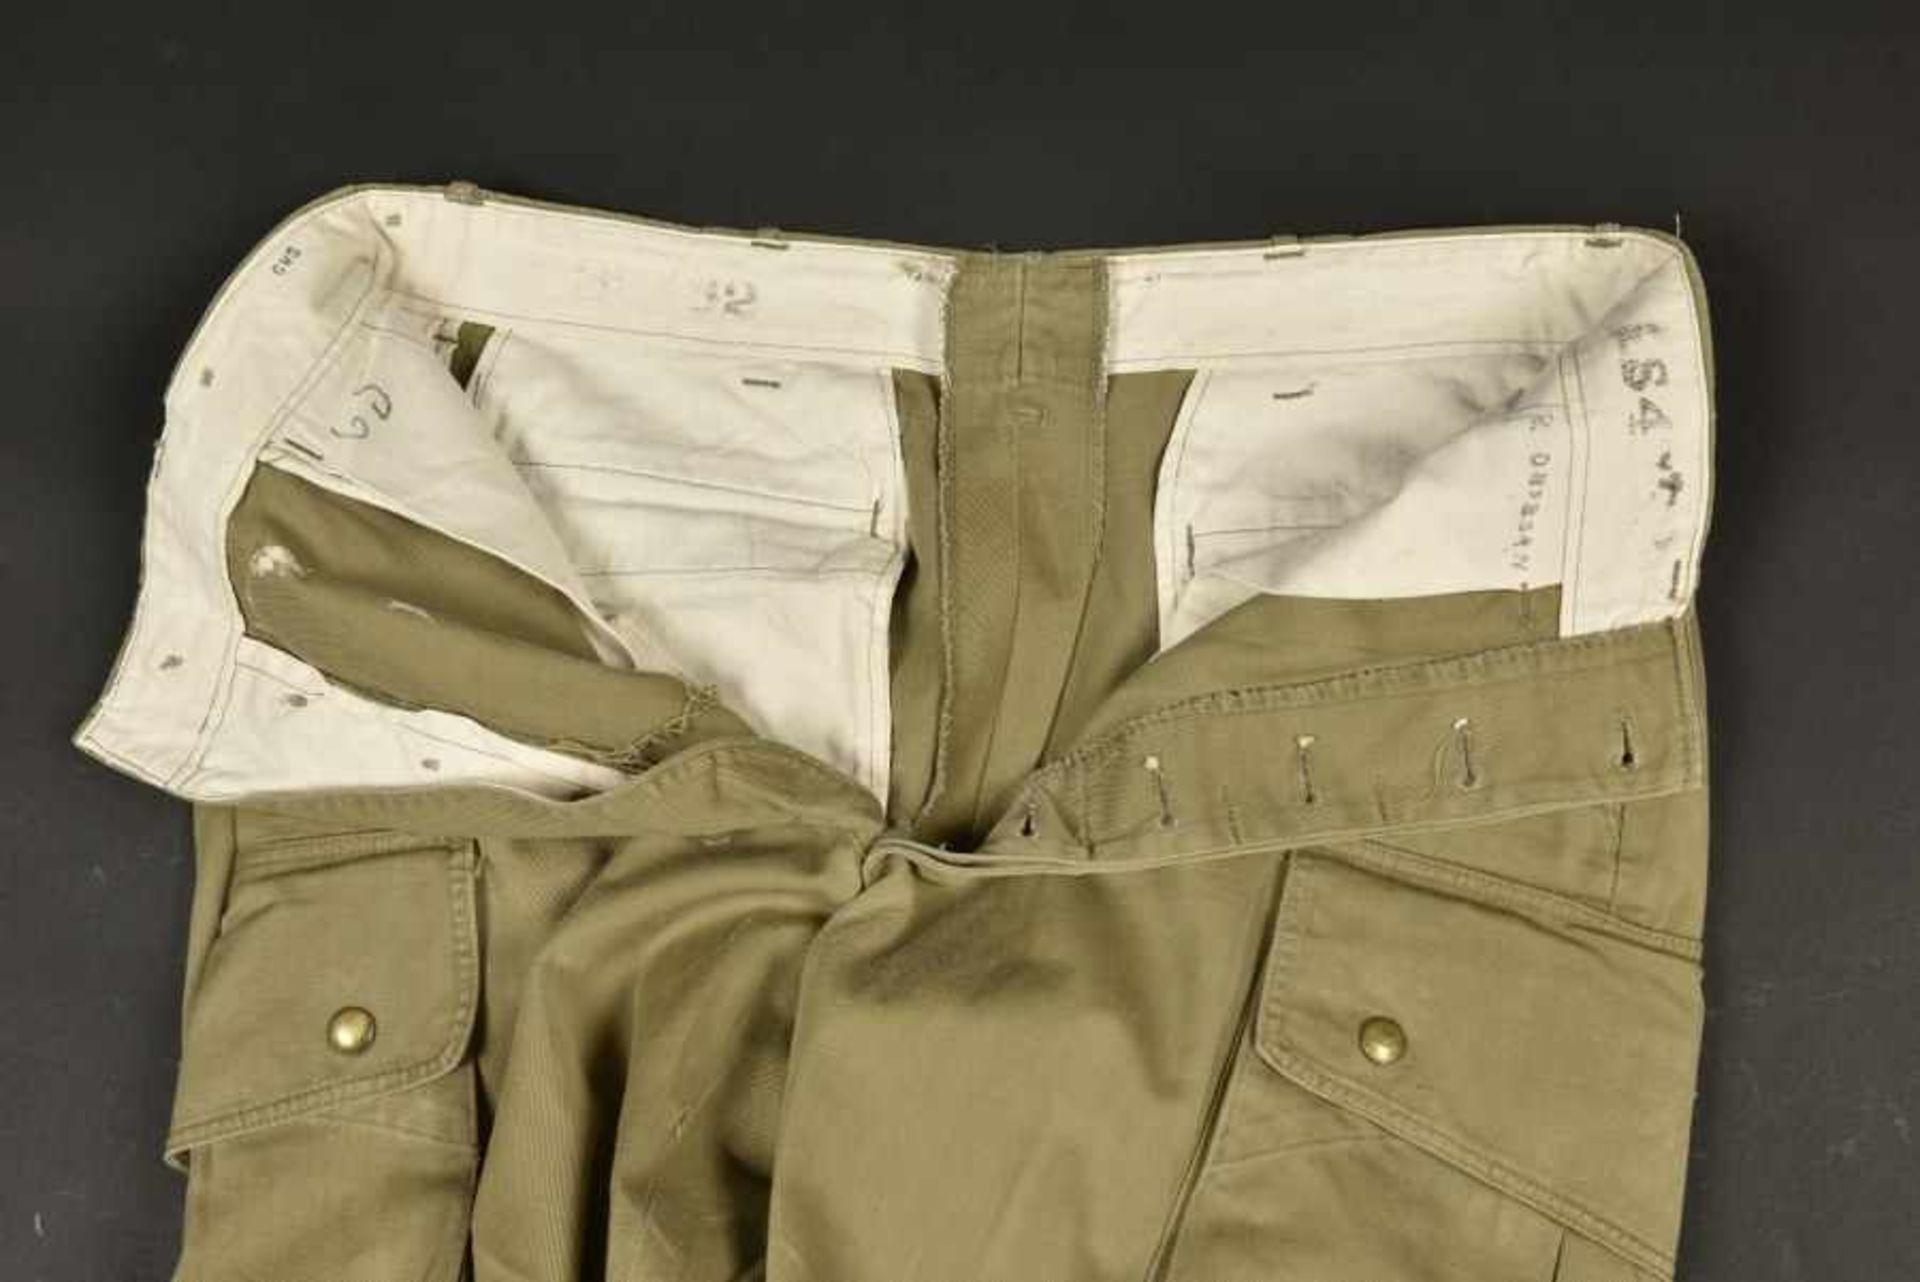 Pantalon du parachutiste américain B Orsborn. Pants of American paratrooper B OrsbornEn popeline, - Bild 4 aus 4